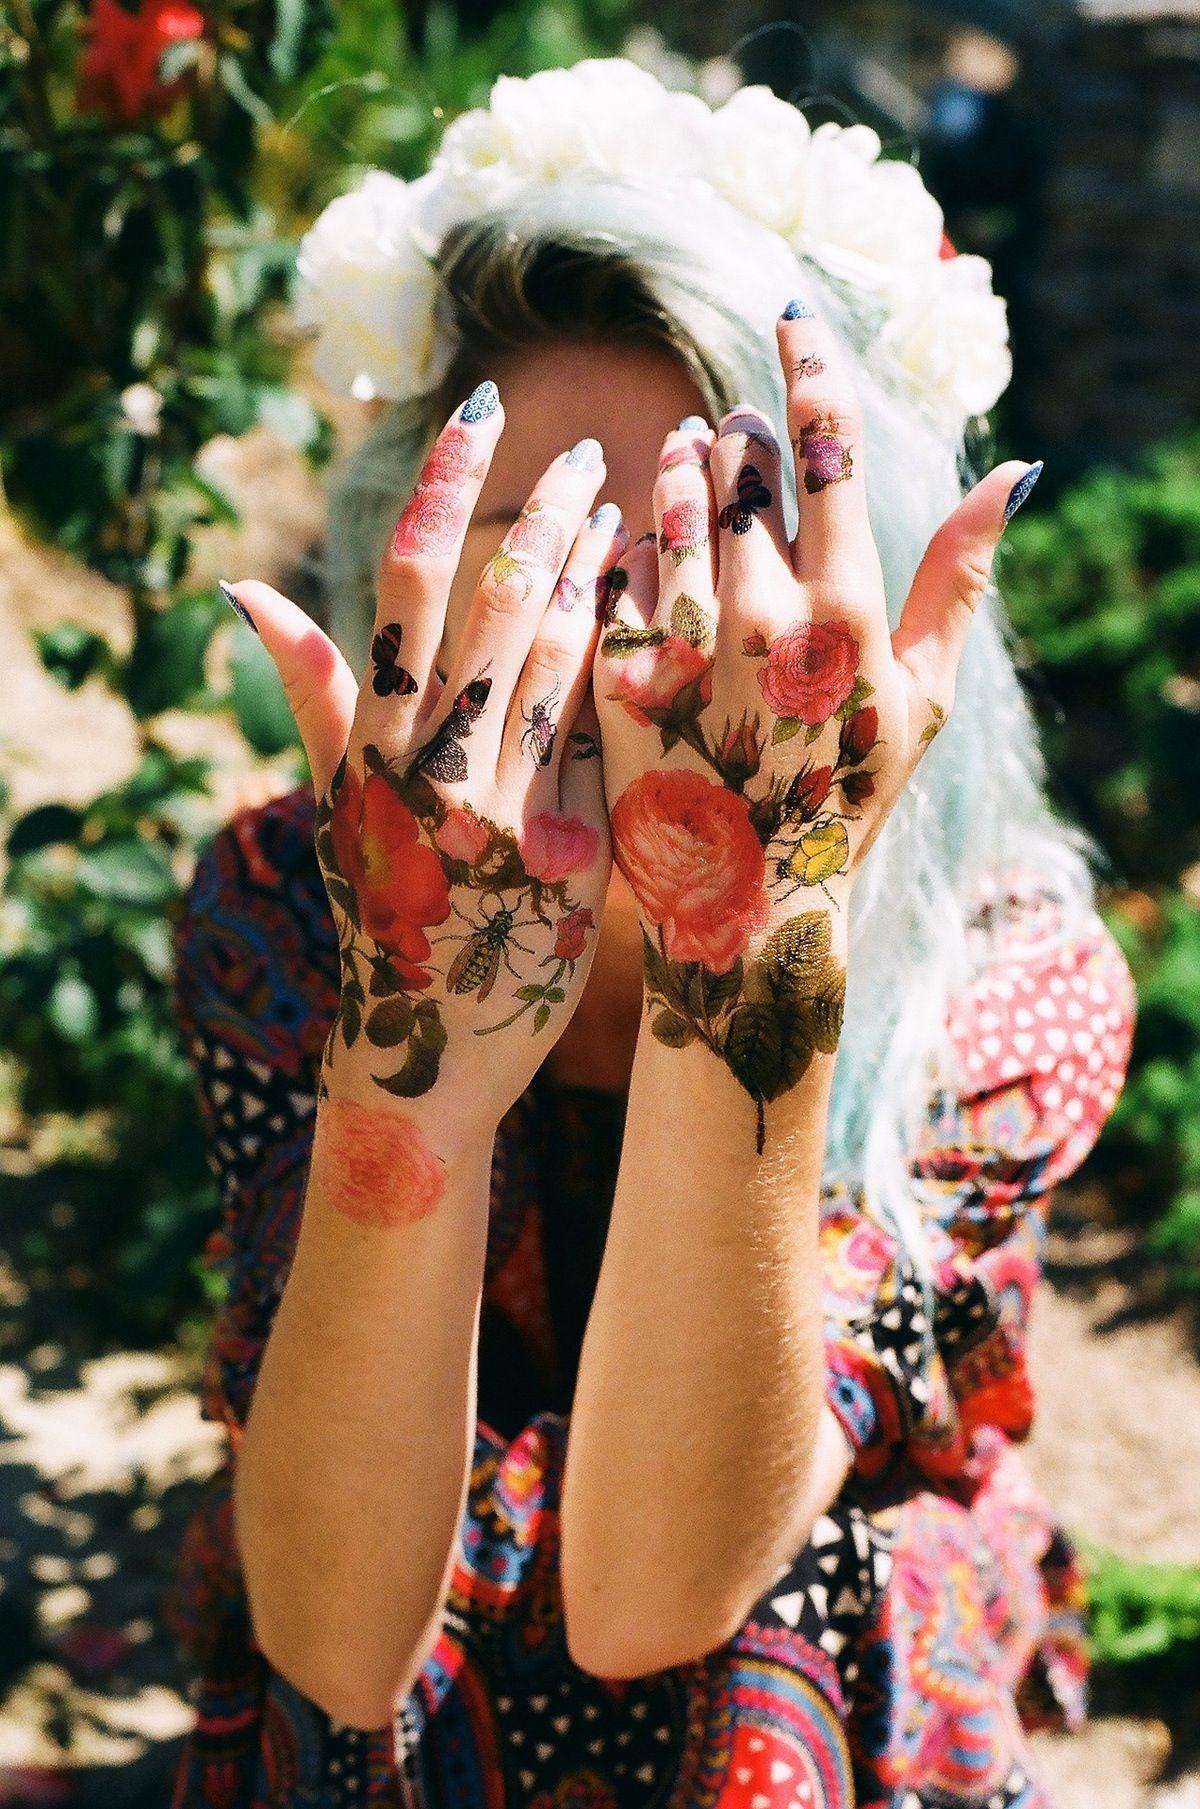 Hand tattoos tattoo ideas hands body art tattoo s floral tattoo - Handtattoo Flower Vintage Hand Tattoo Ink Inked Beautiful Girl Cute Tattooedgirl Girls With Tattoos Nice Flowercrown Pastelhair